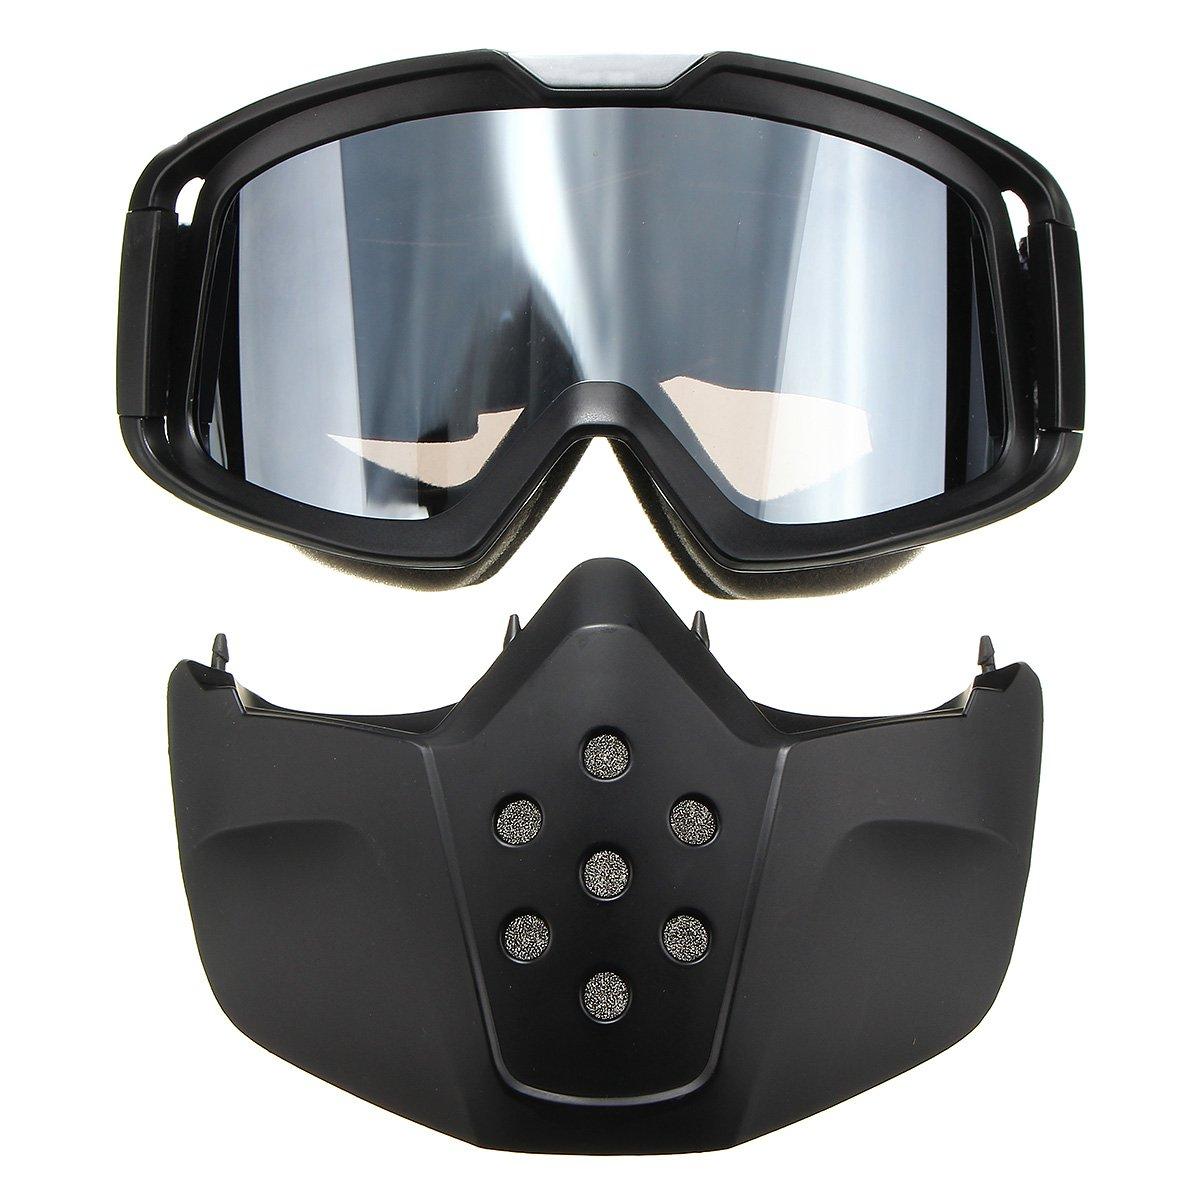 Naik Sepeda Motor Kacamata Hitam Modular Masker Dilepas Kacamata untuk Helm  Wajah Terbuka Sepeda Motor Setengah 408d1555f5